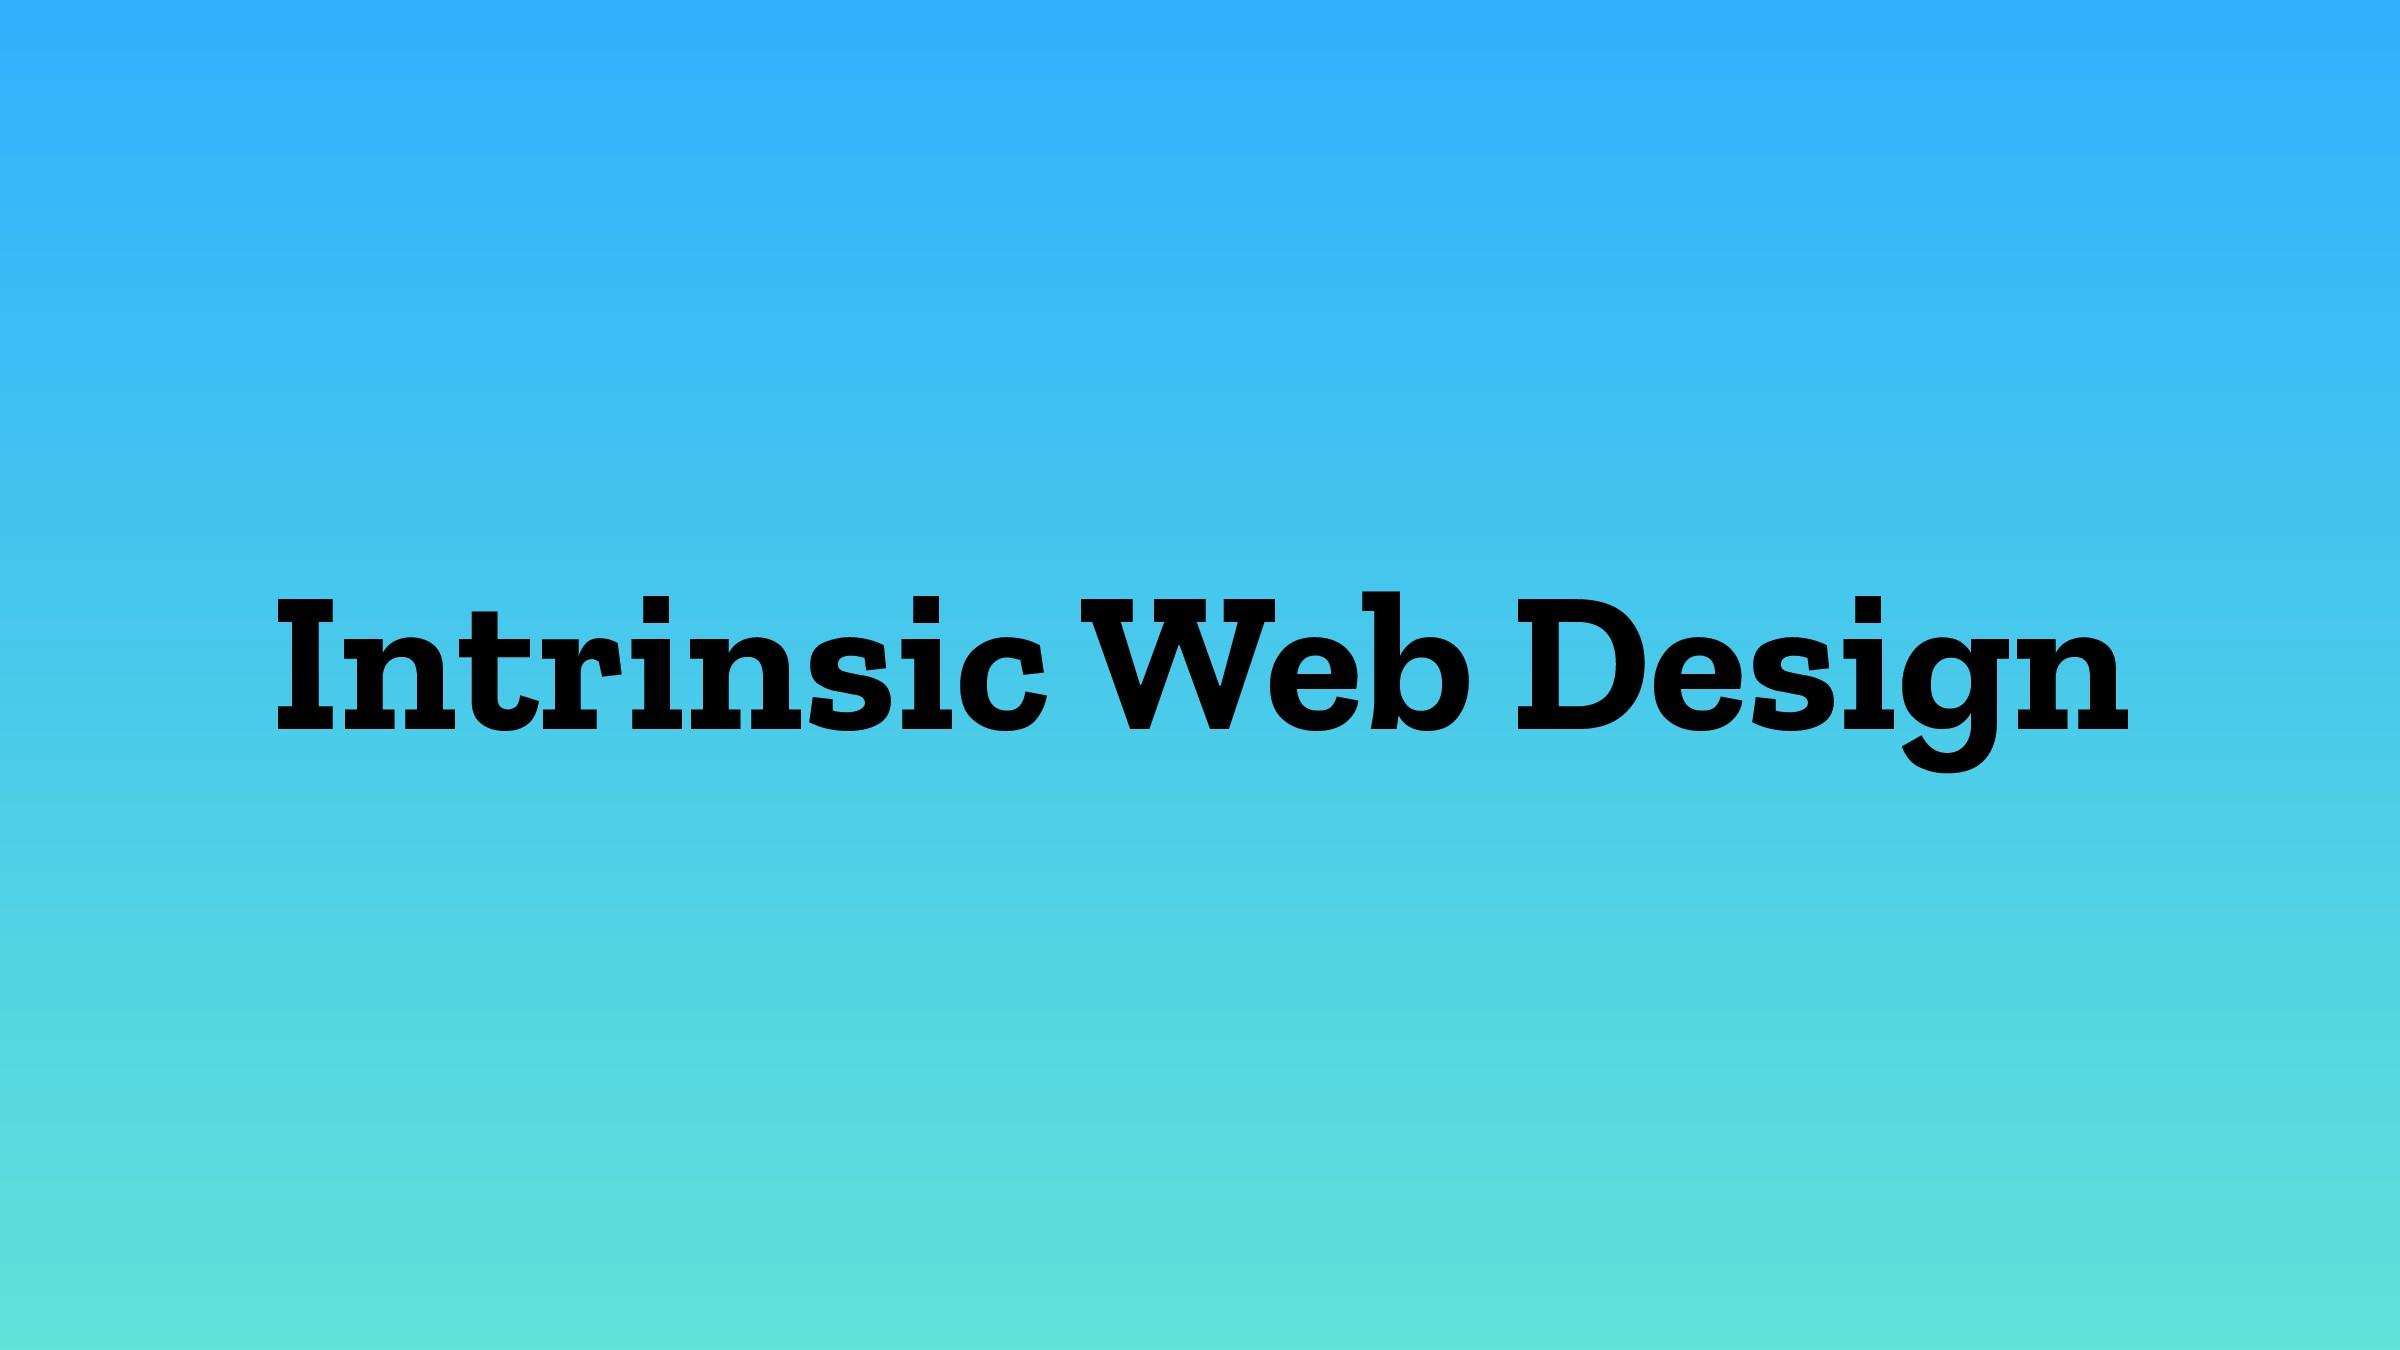 Intrinsic Web Design